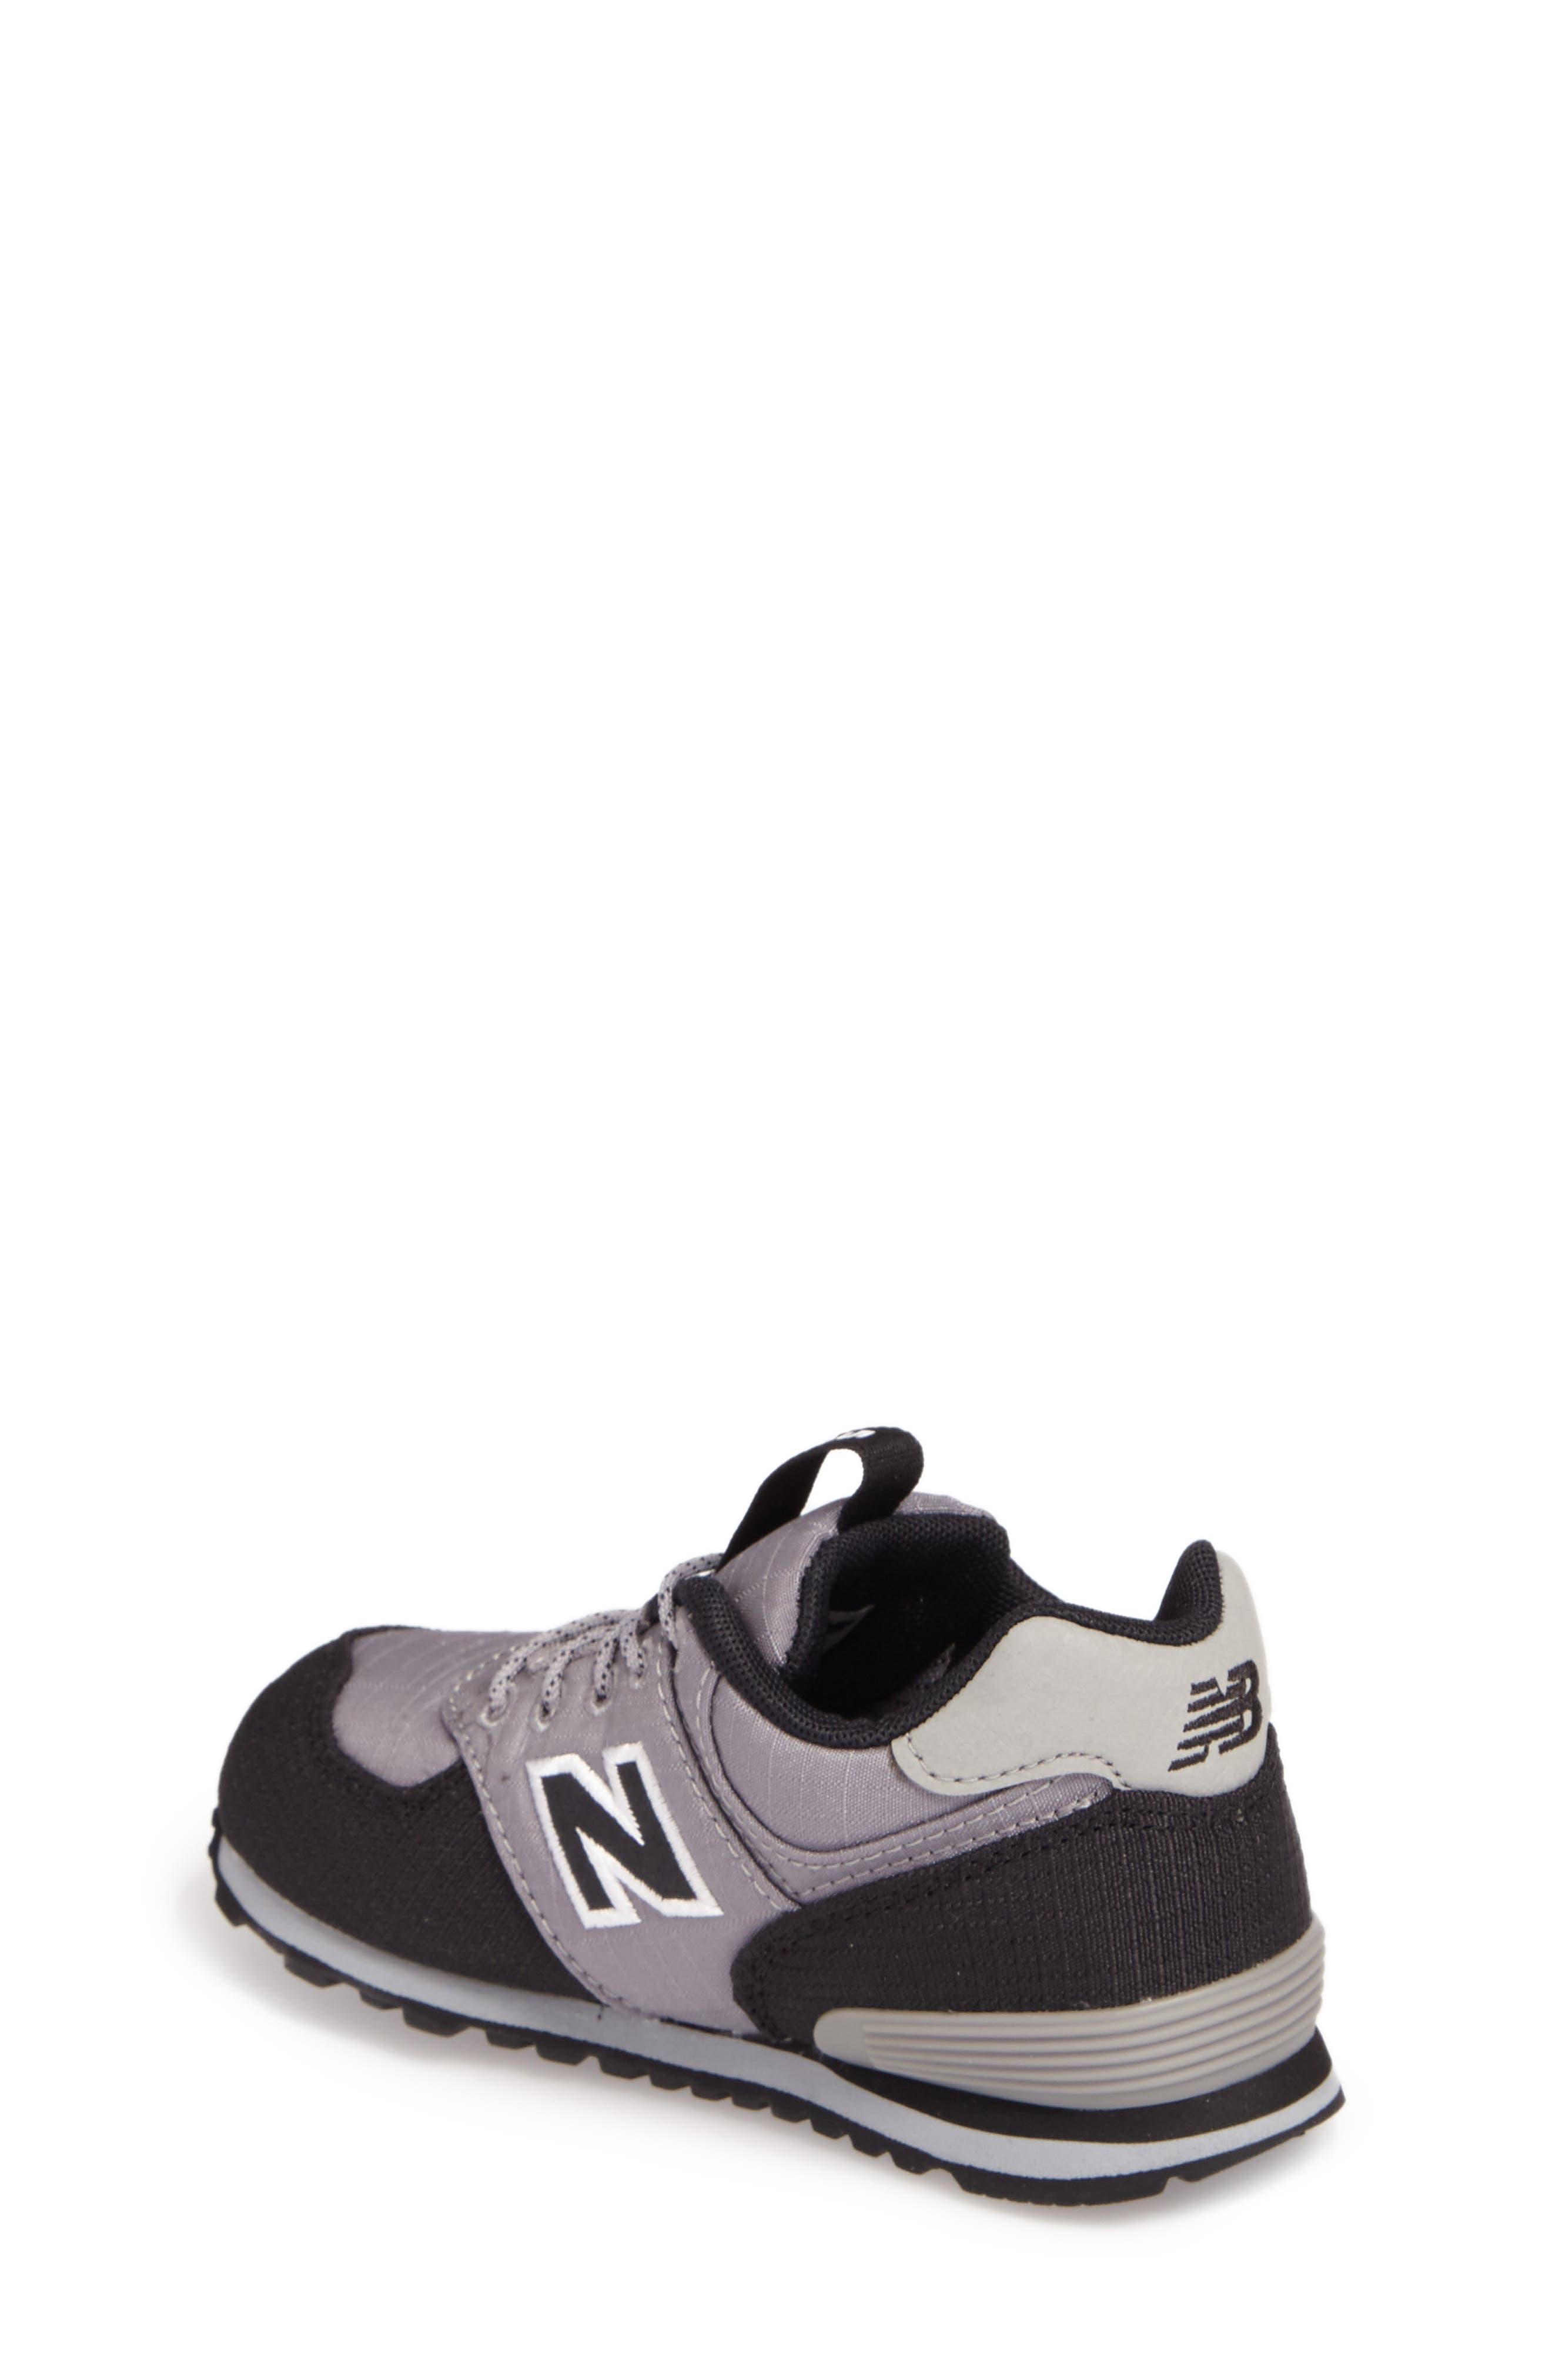 574 Sneaker,                             Alternate thumbnail 2, color,                             Grey